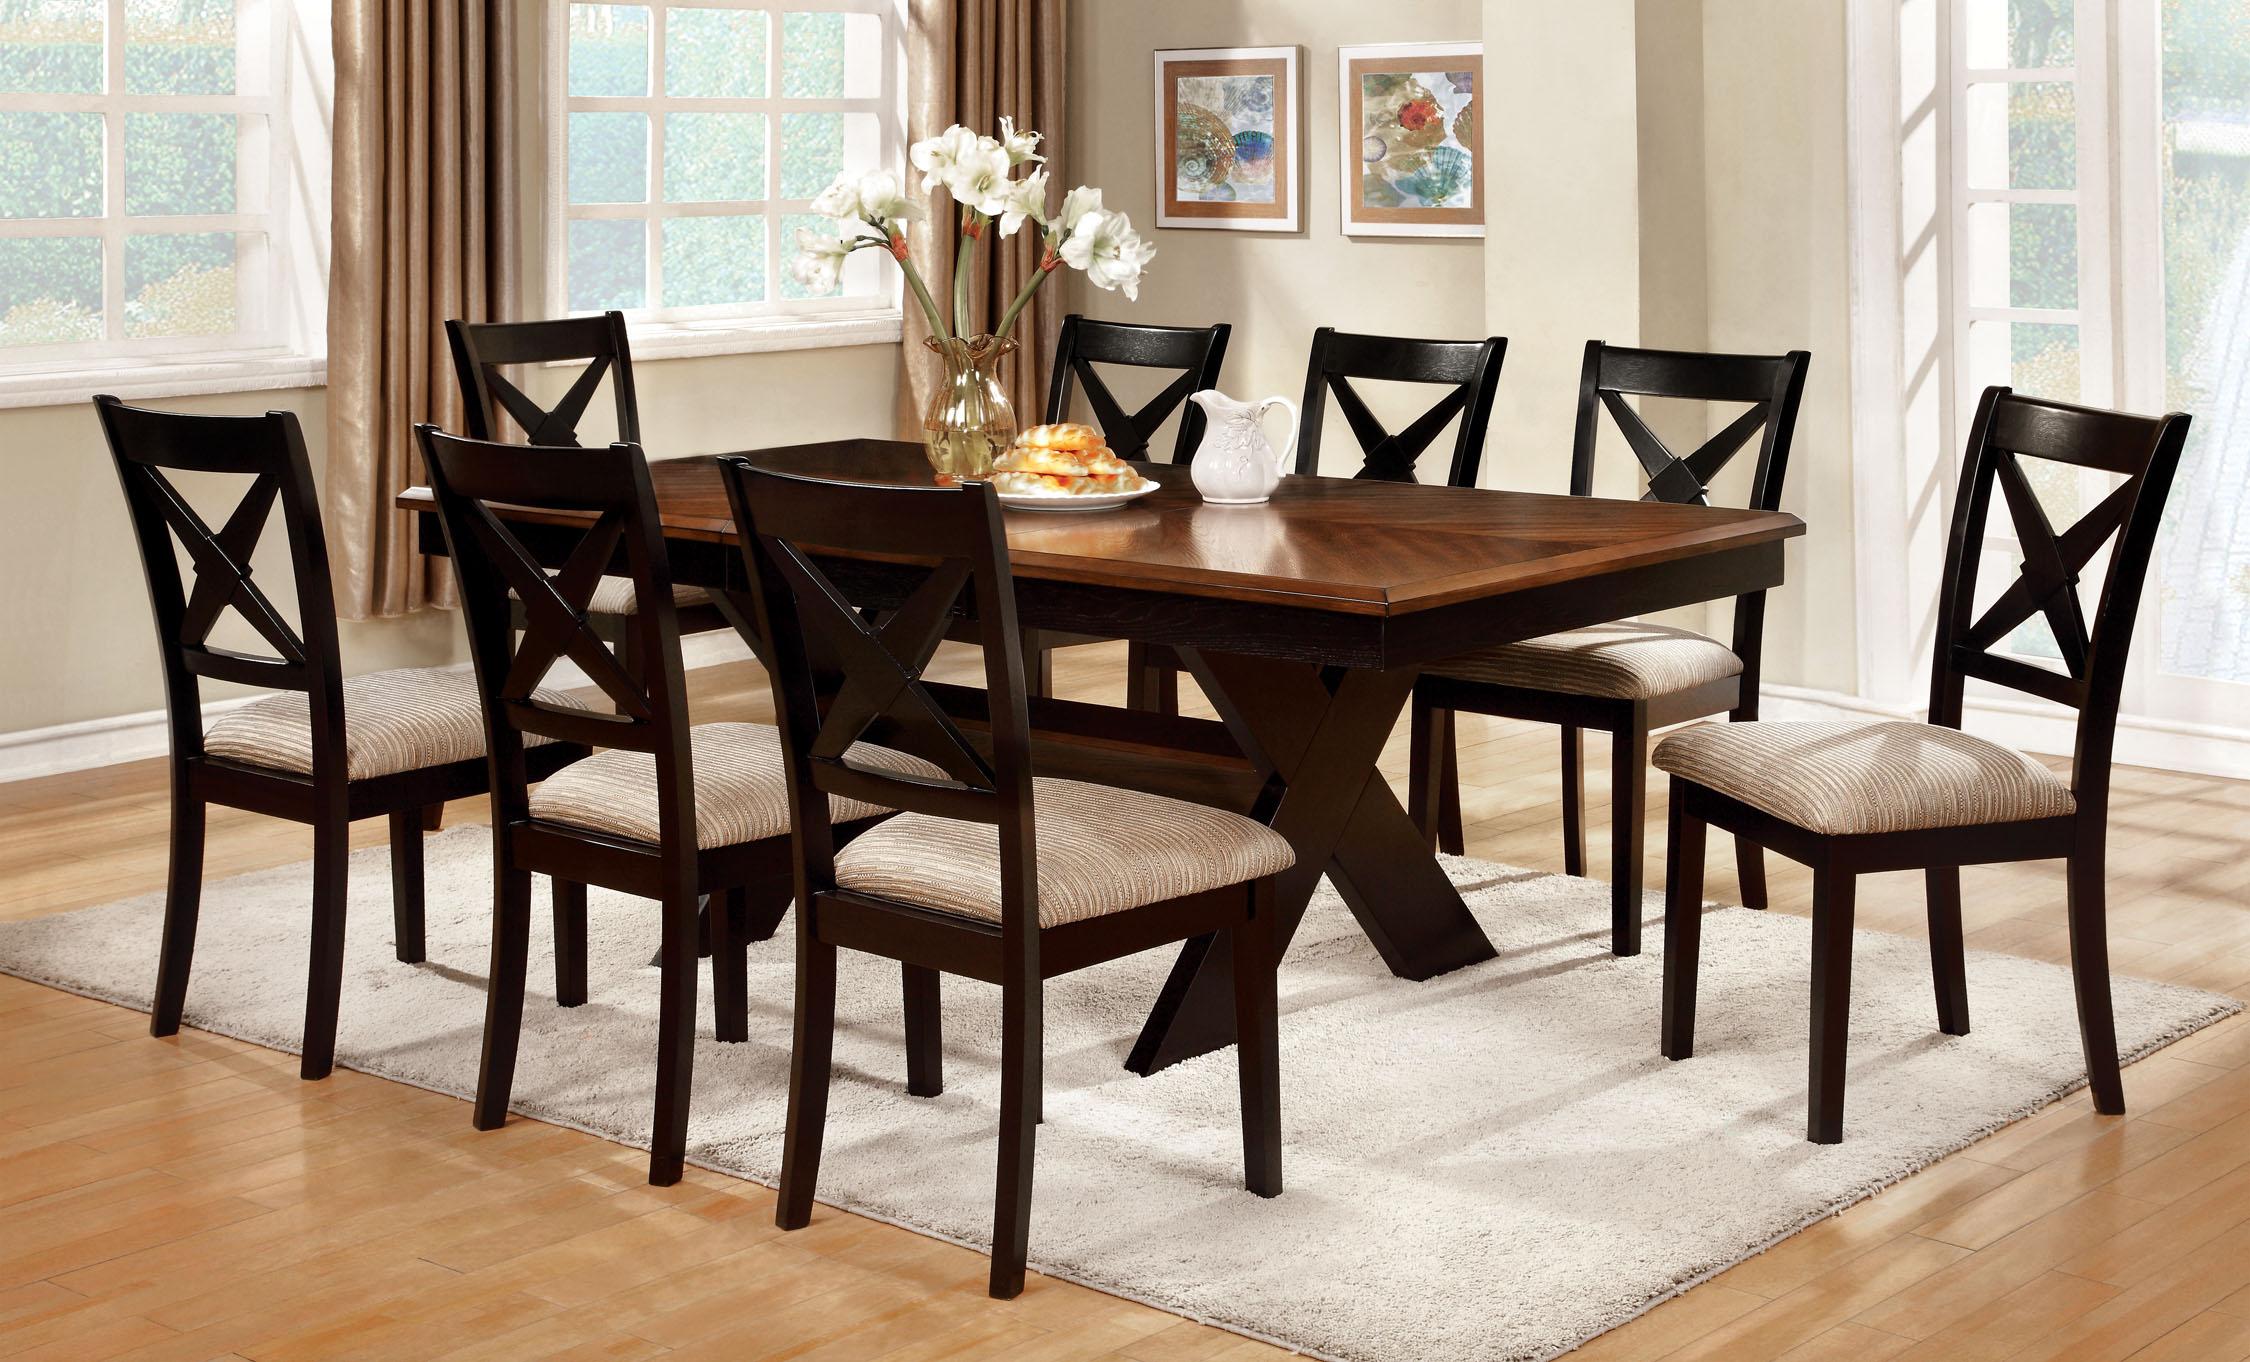 Furniture of America Cresanka 9-Piece Dark Oak and Black Dining Set